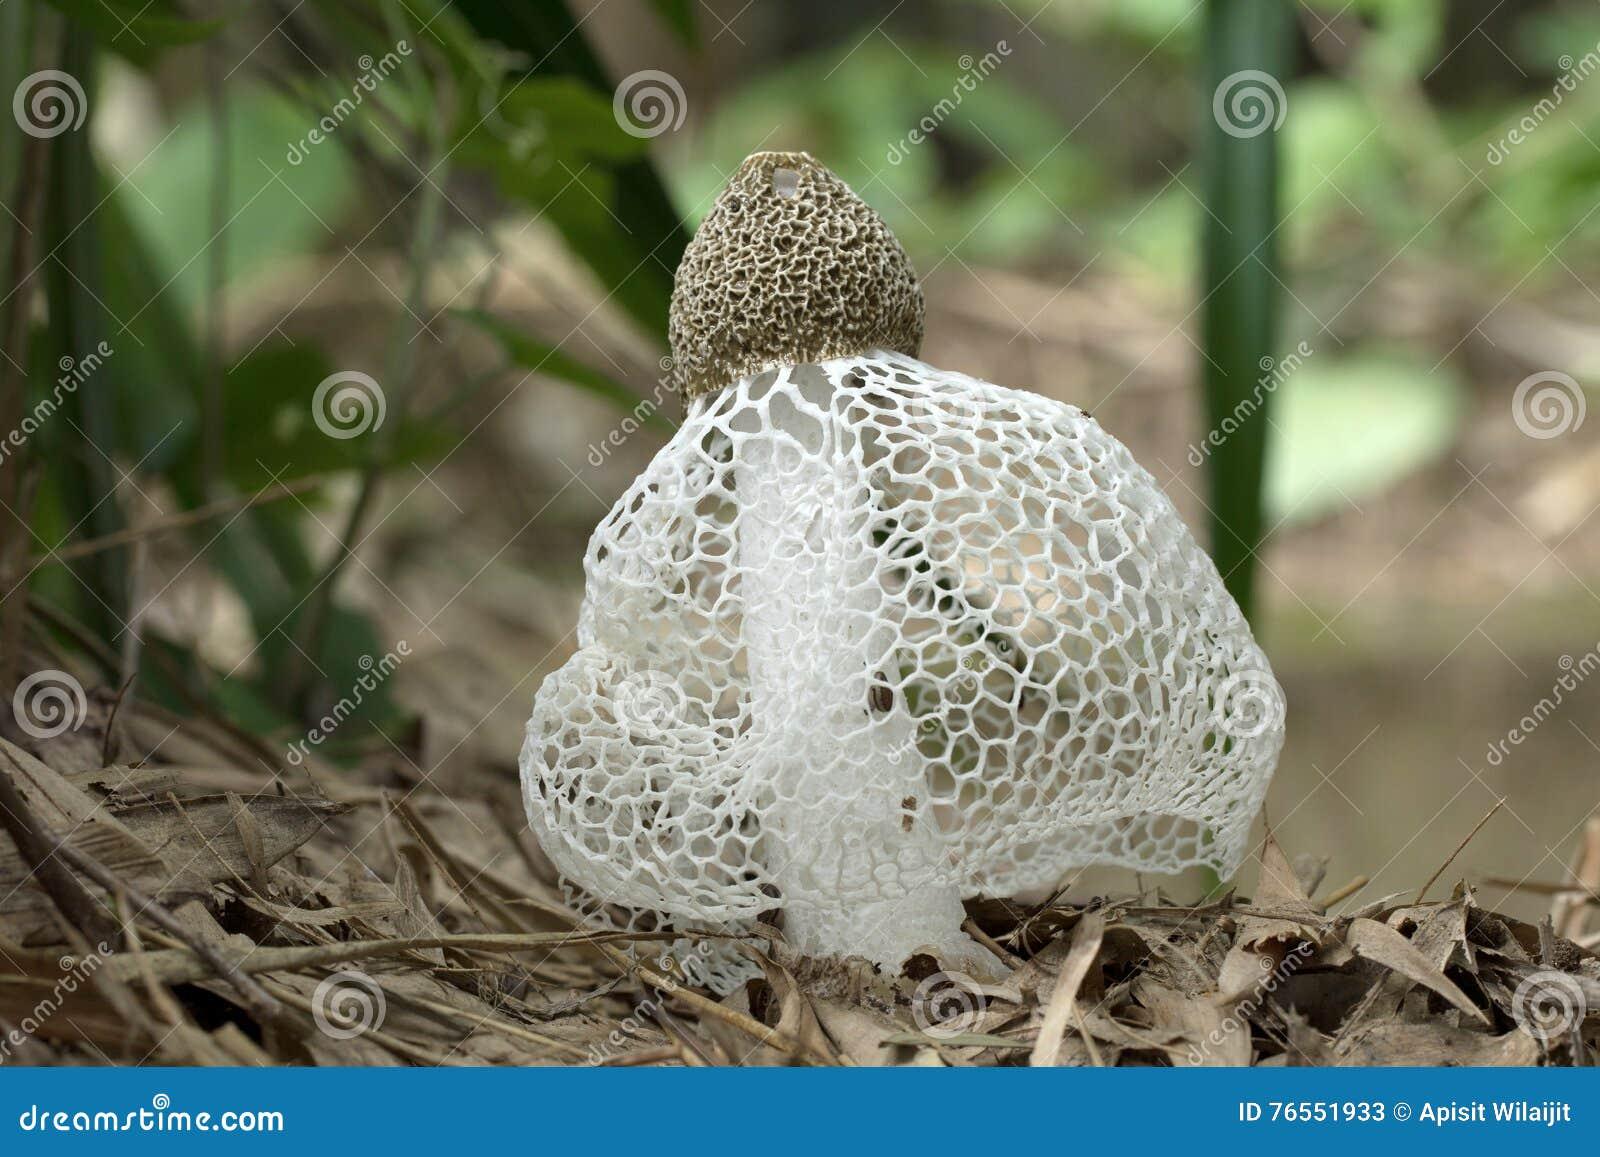 бамбуковый гриб фото